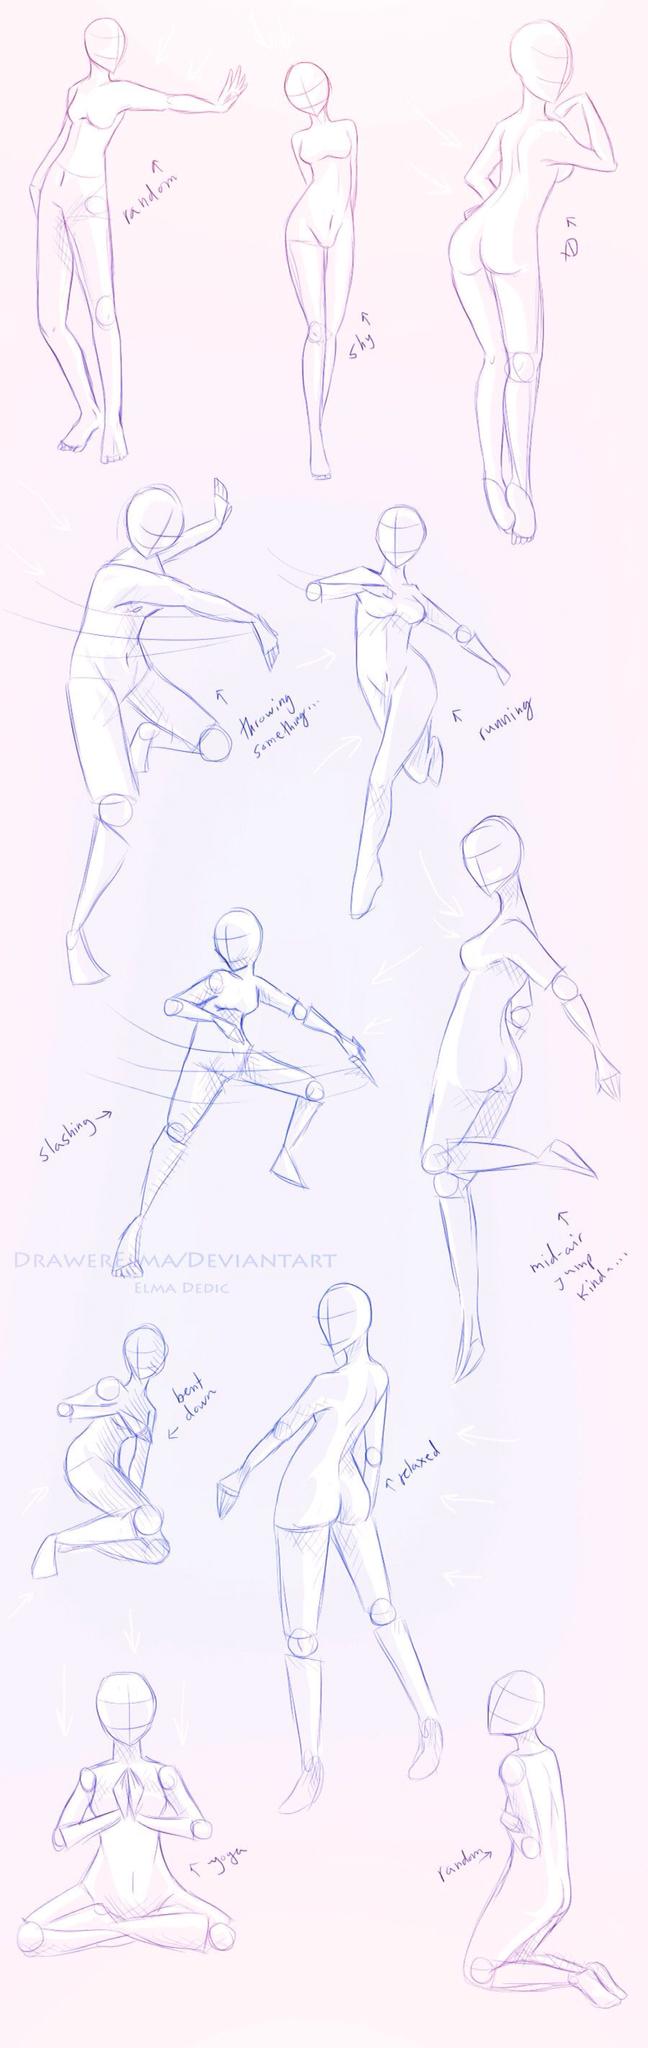 Pin de Rin chan en Drawing | Pinterest | Bocetos, Dibujo y Anatomía